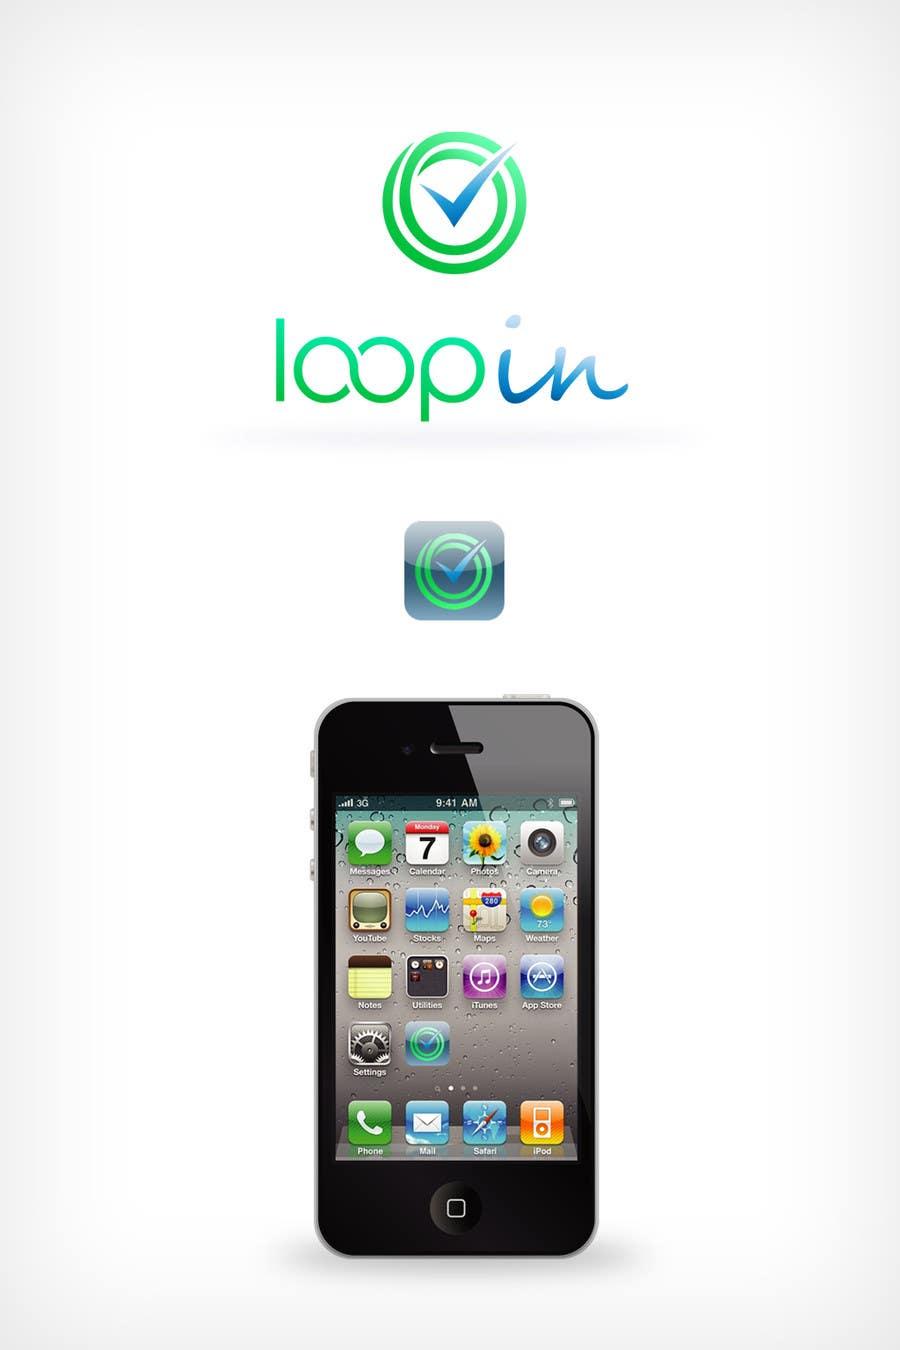 Bài tham dự cuộc thi #                                        36                                      cho                                         Logo Design for Film Related Task Management mobile applicatoin